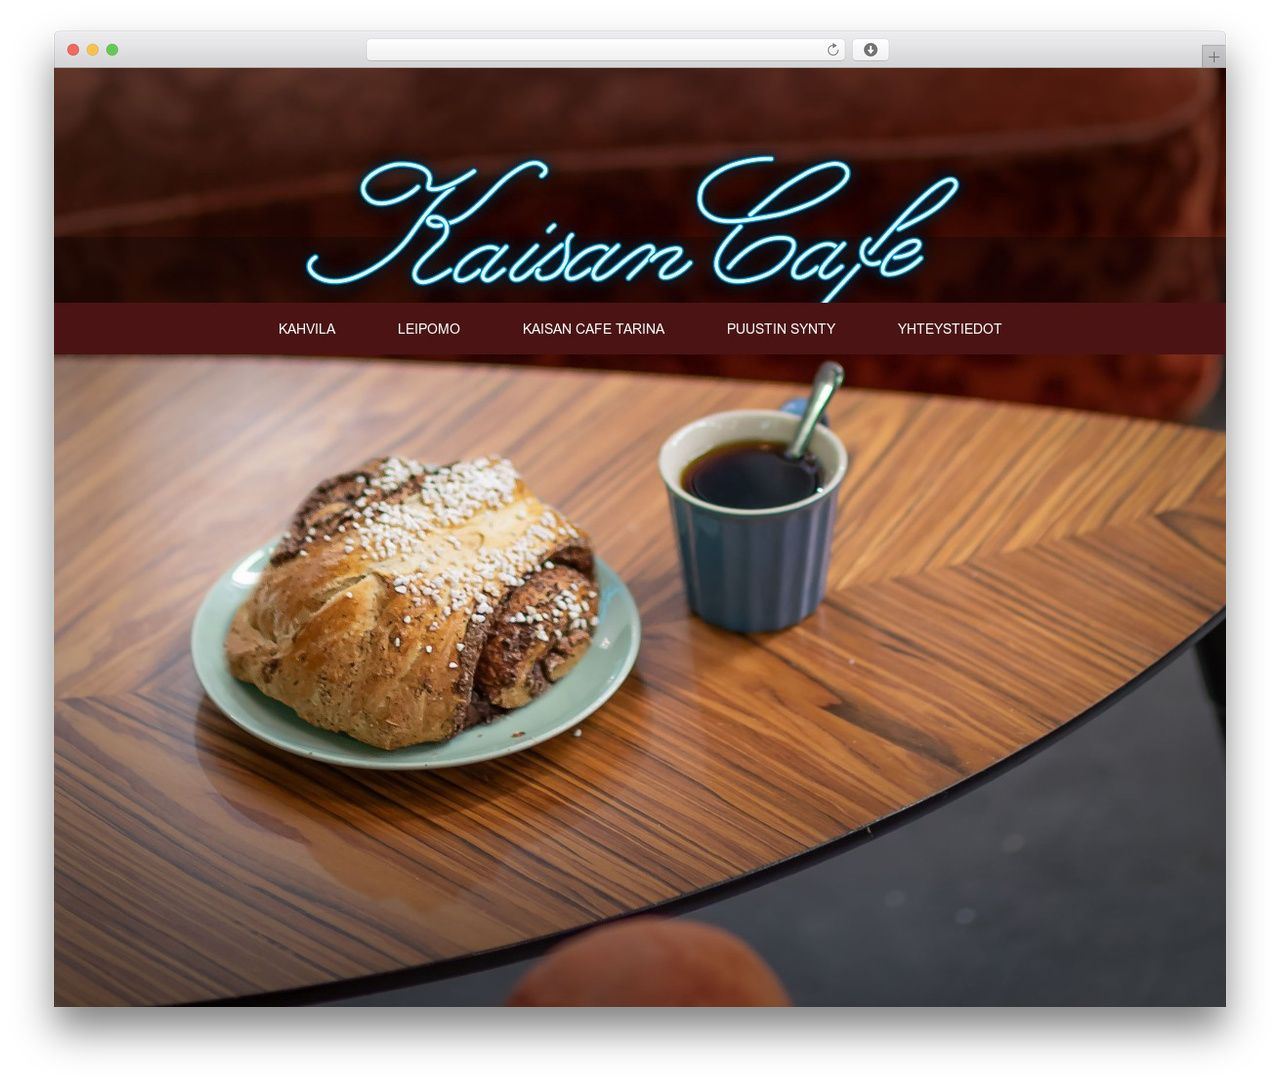 Divi premium WordPress theme by Elegant Themes - kaisancafe.com